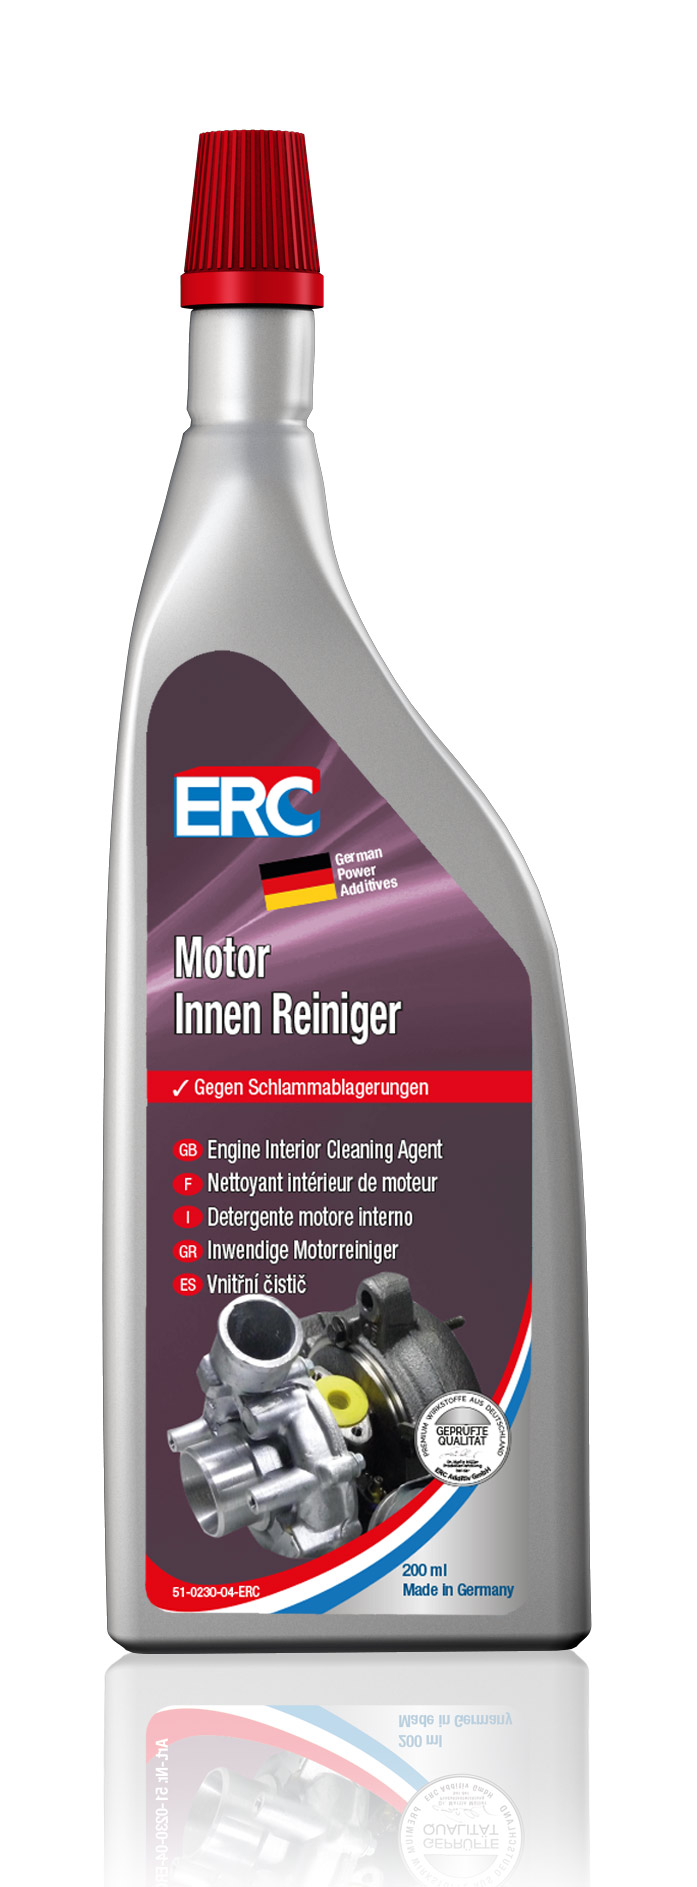 10 x 200 ml ERC Motorinnenreiniger Motor Innen Reiniger Innenreiniger Motorspülung